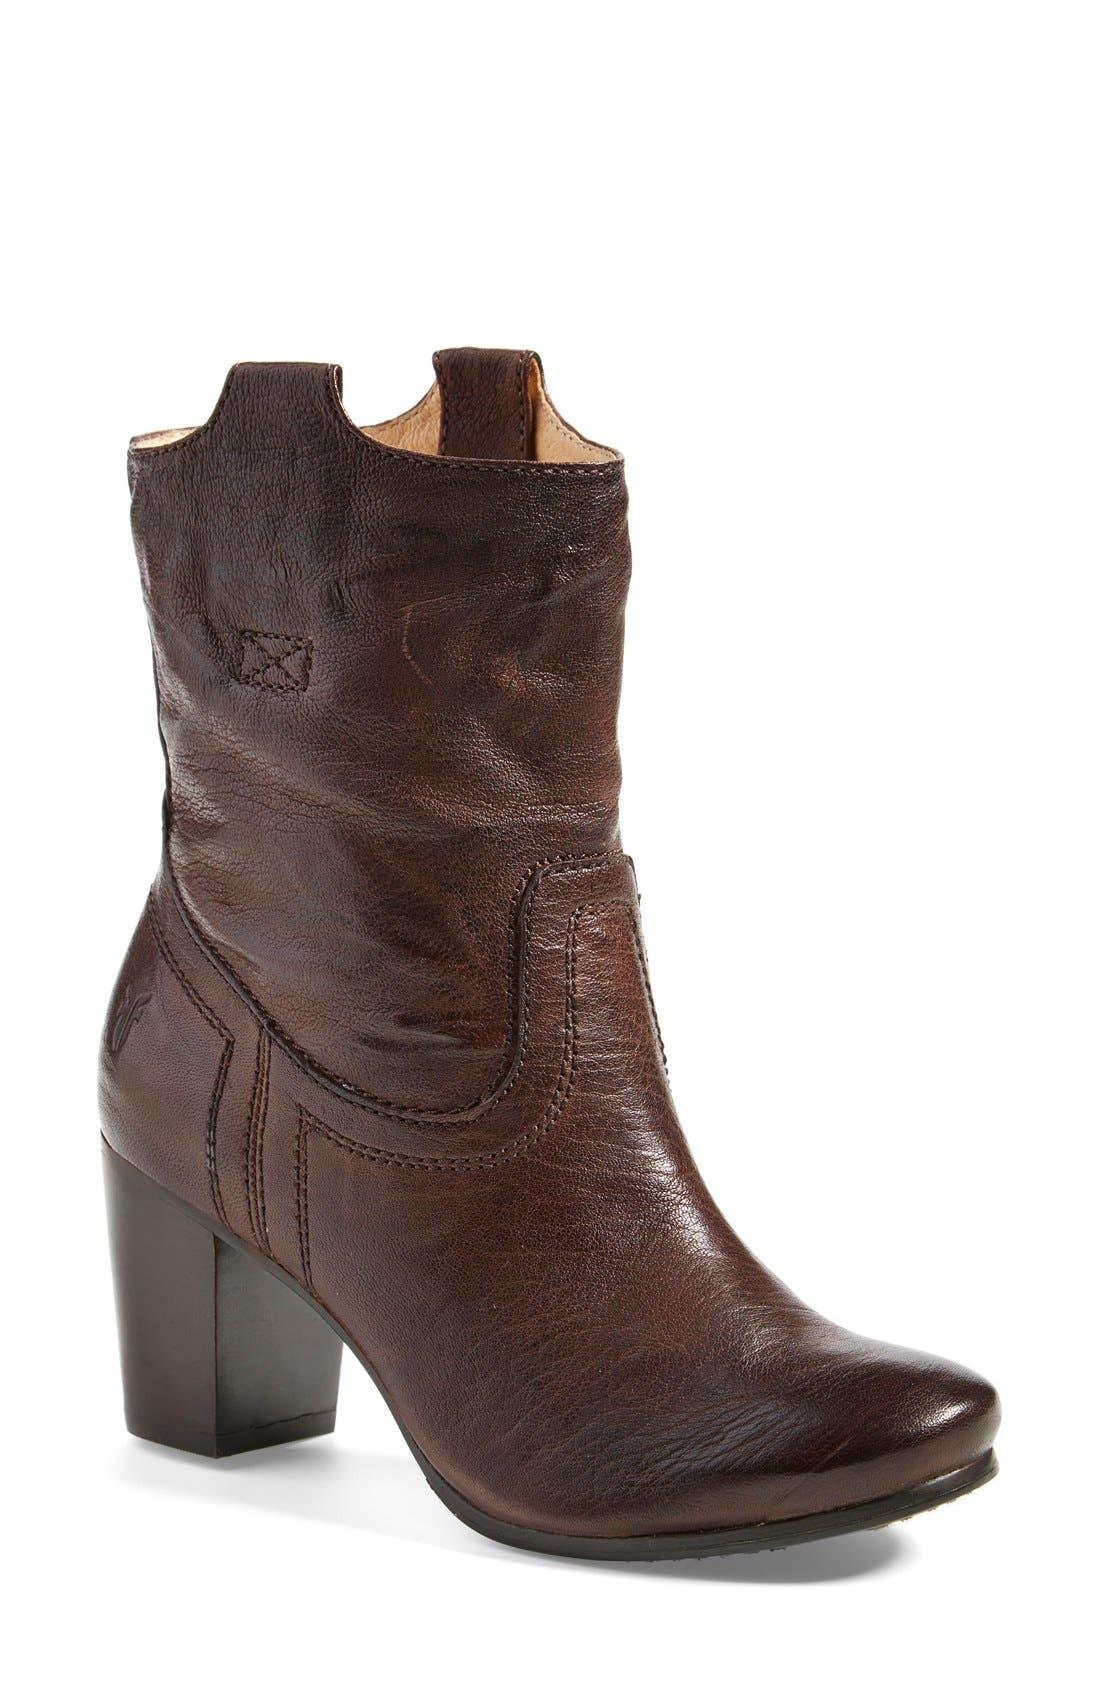 Alternate Image 1 Selected - Frye 'Carson' Mid Heel Tab Short Boot (Women)